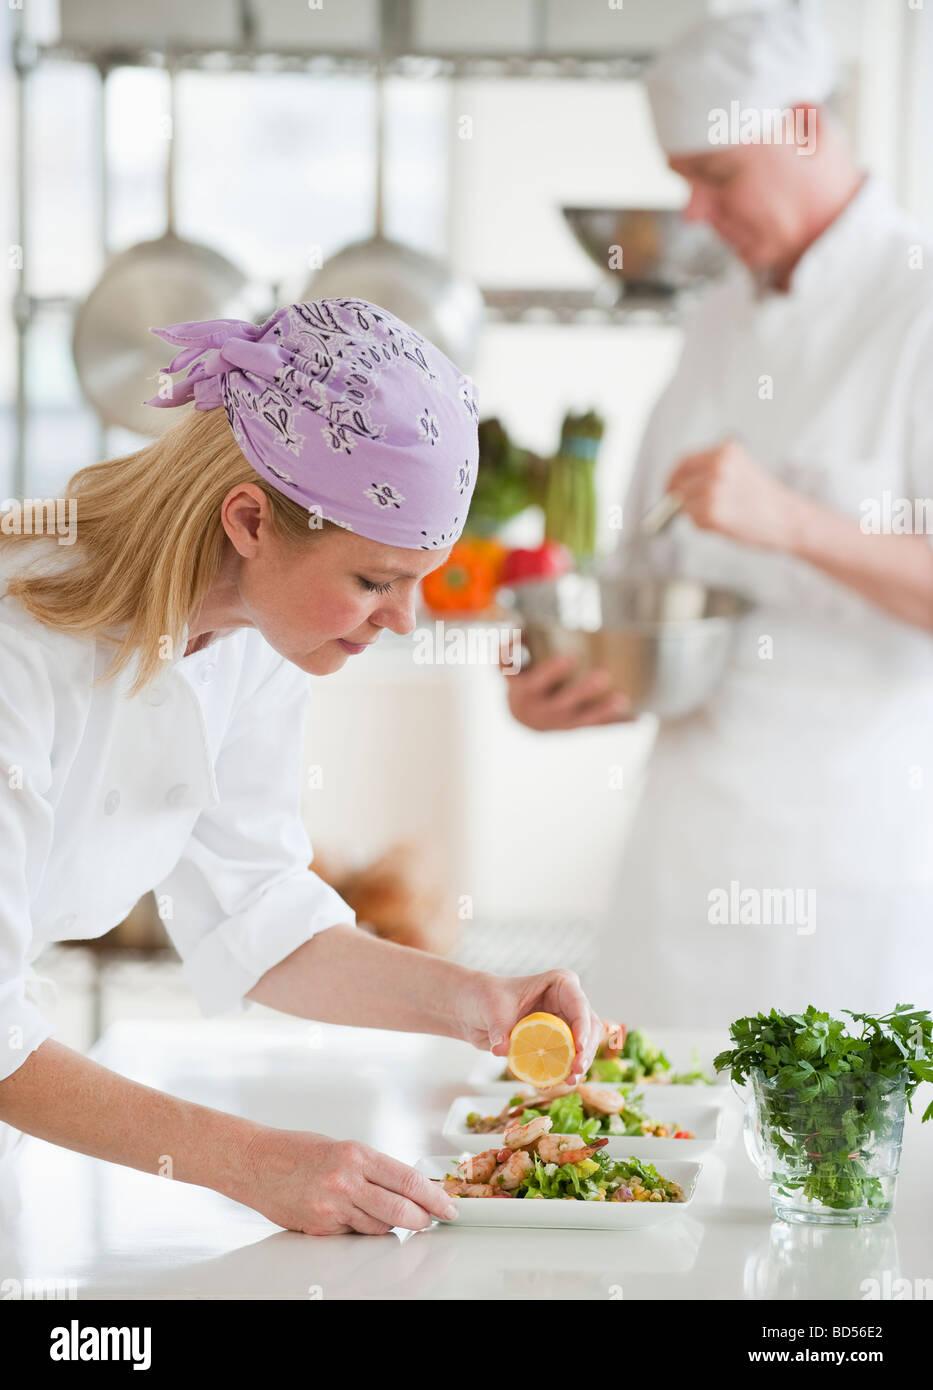 Restaurant Workers Kitchen Stock Photos & Restaurant Workers Kitchen ...